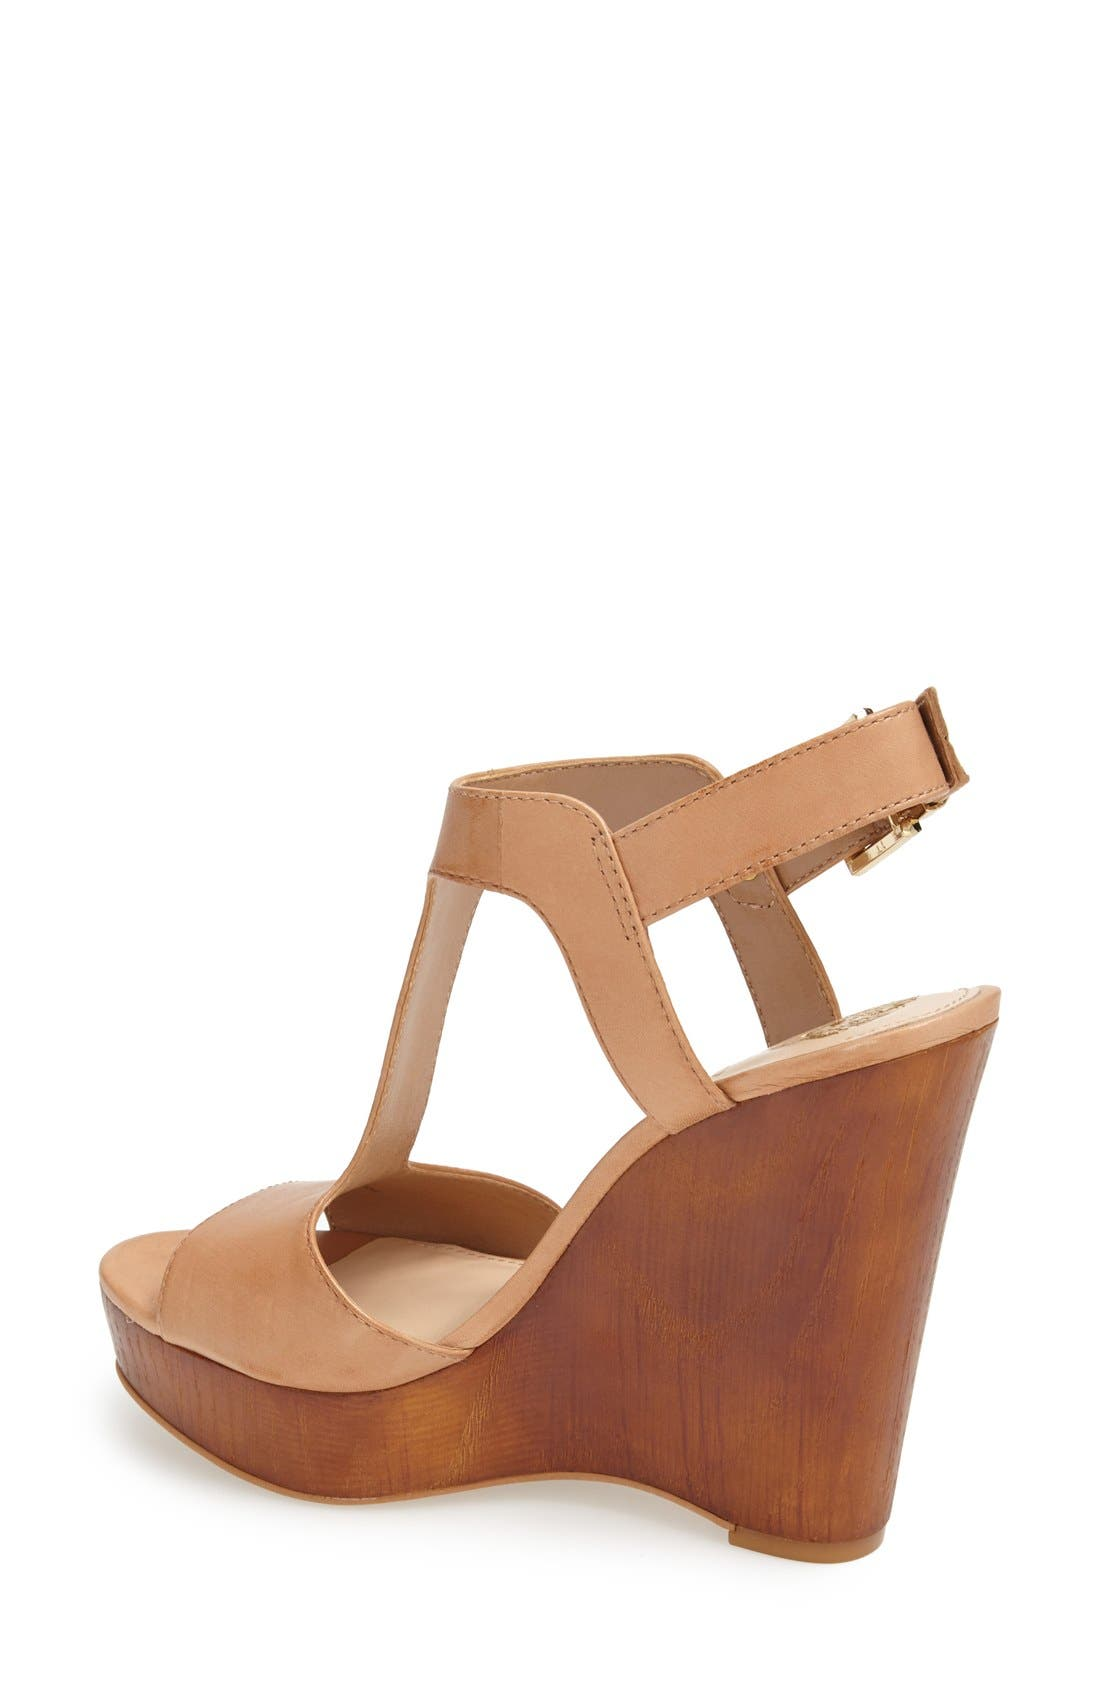 Alternate Image 2  - Vince Camuto 'Mathis' T-Strap Wedge Sandal (Women)